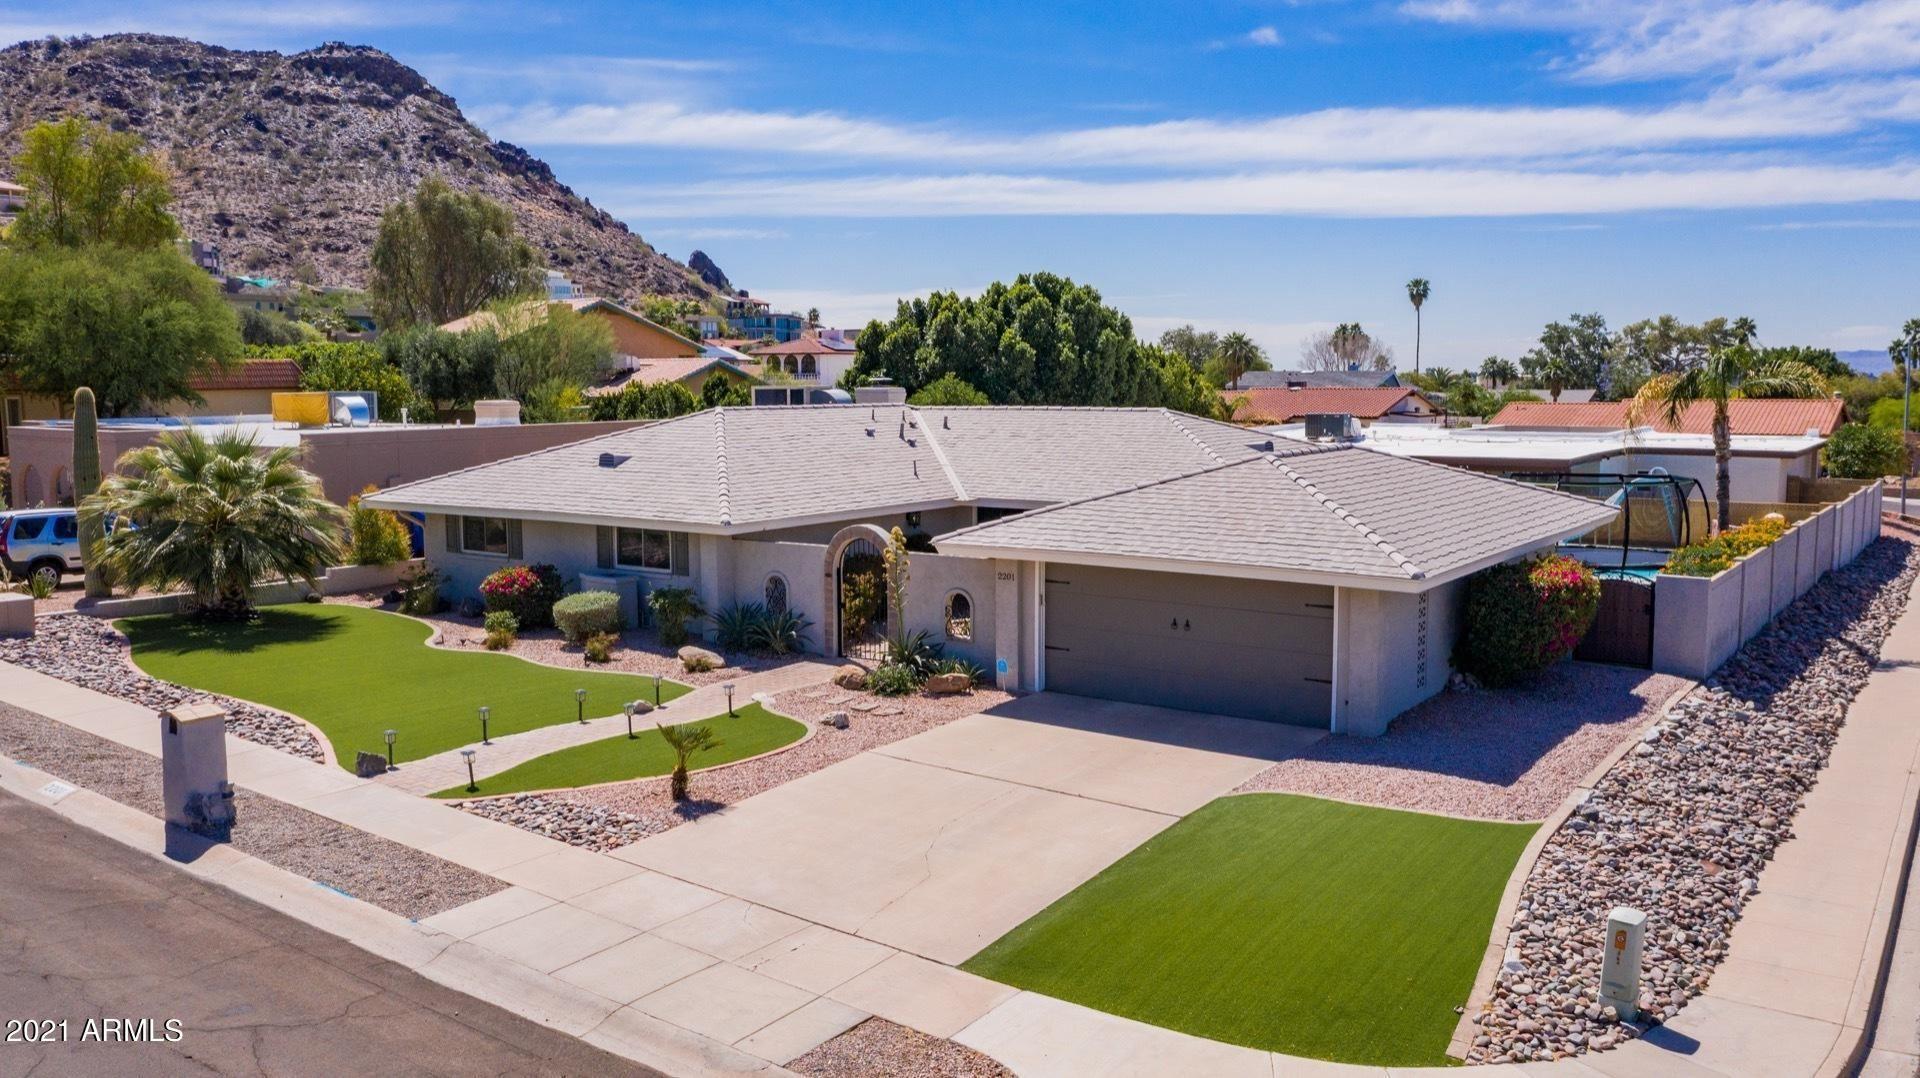 2201 E NORTHVIEW Avenue, Phoenix, AZ 85020 - MLS#: 6230971